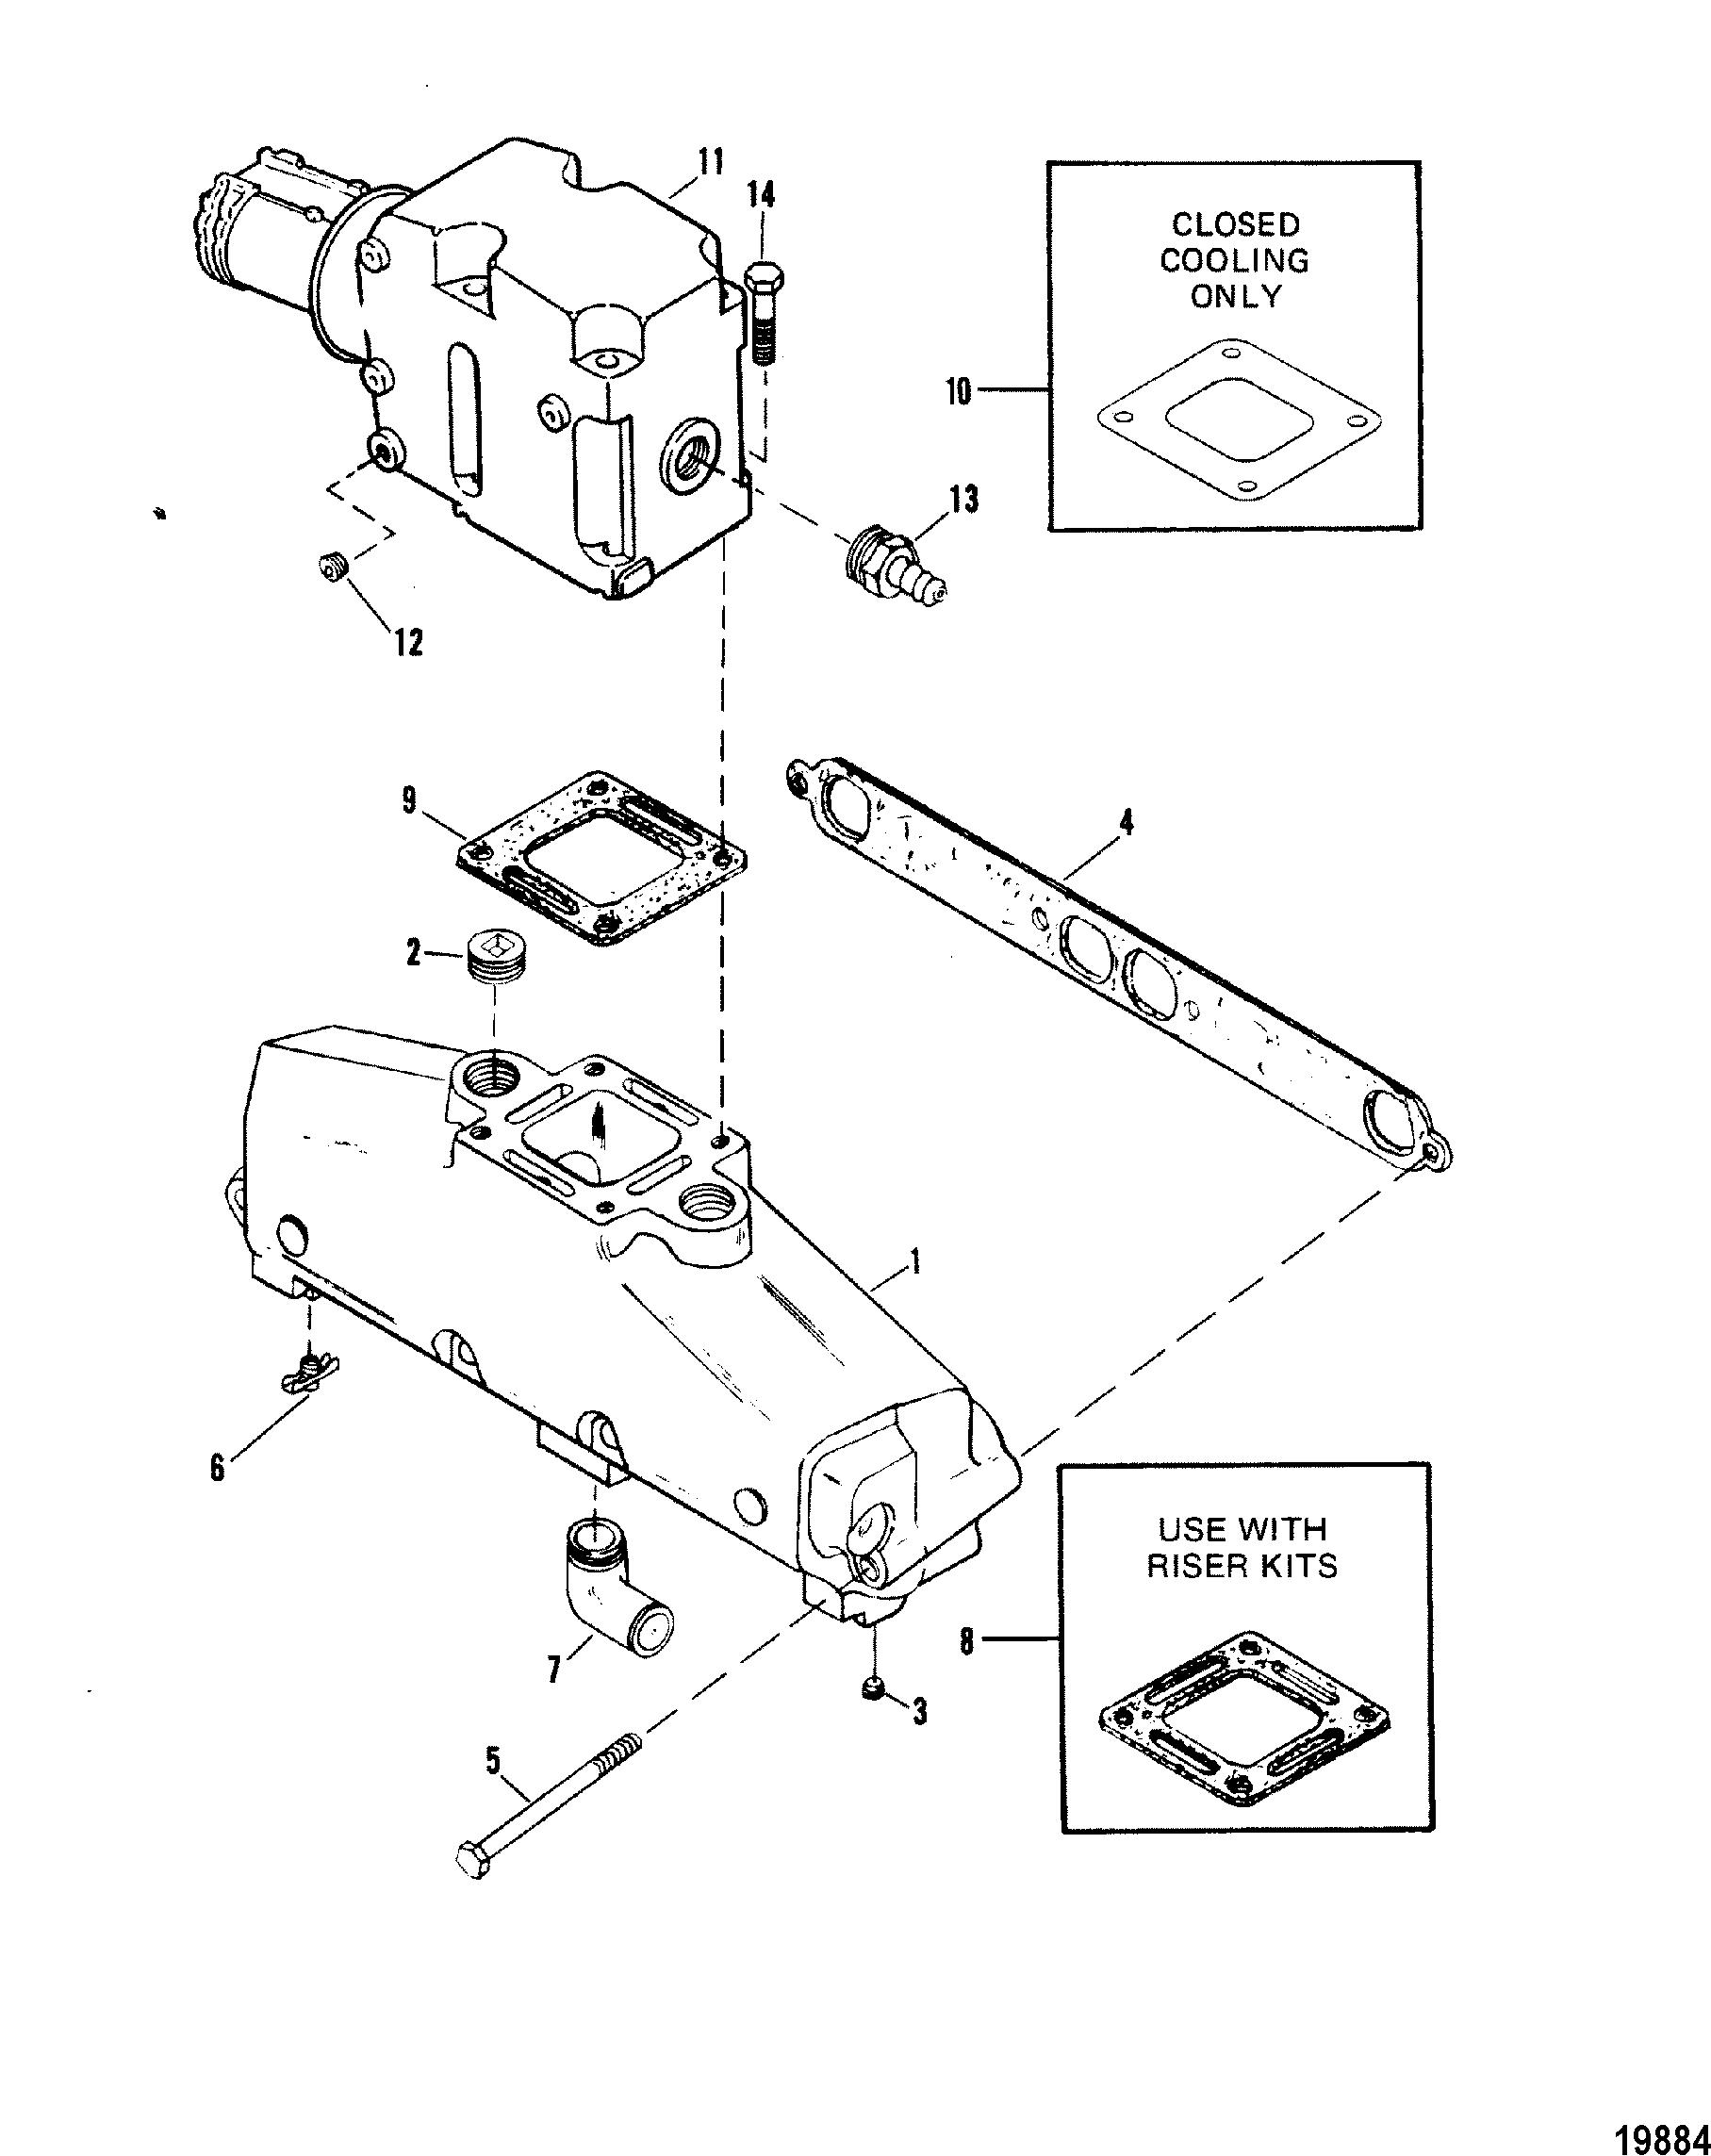 Ford 302 Carburetor And Intake Com